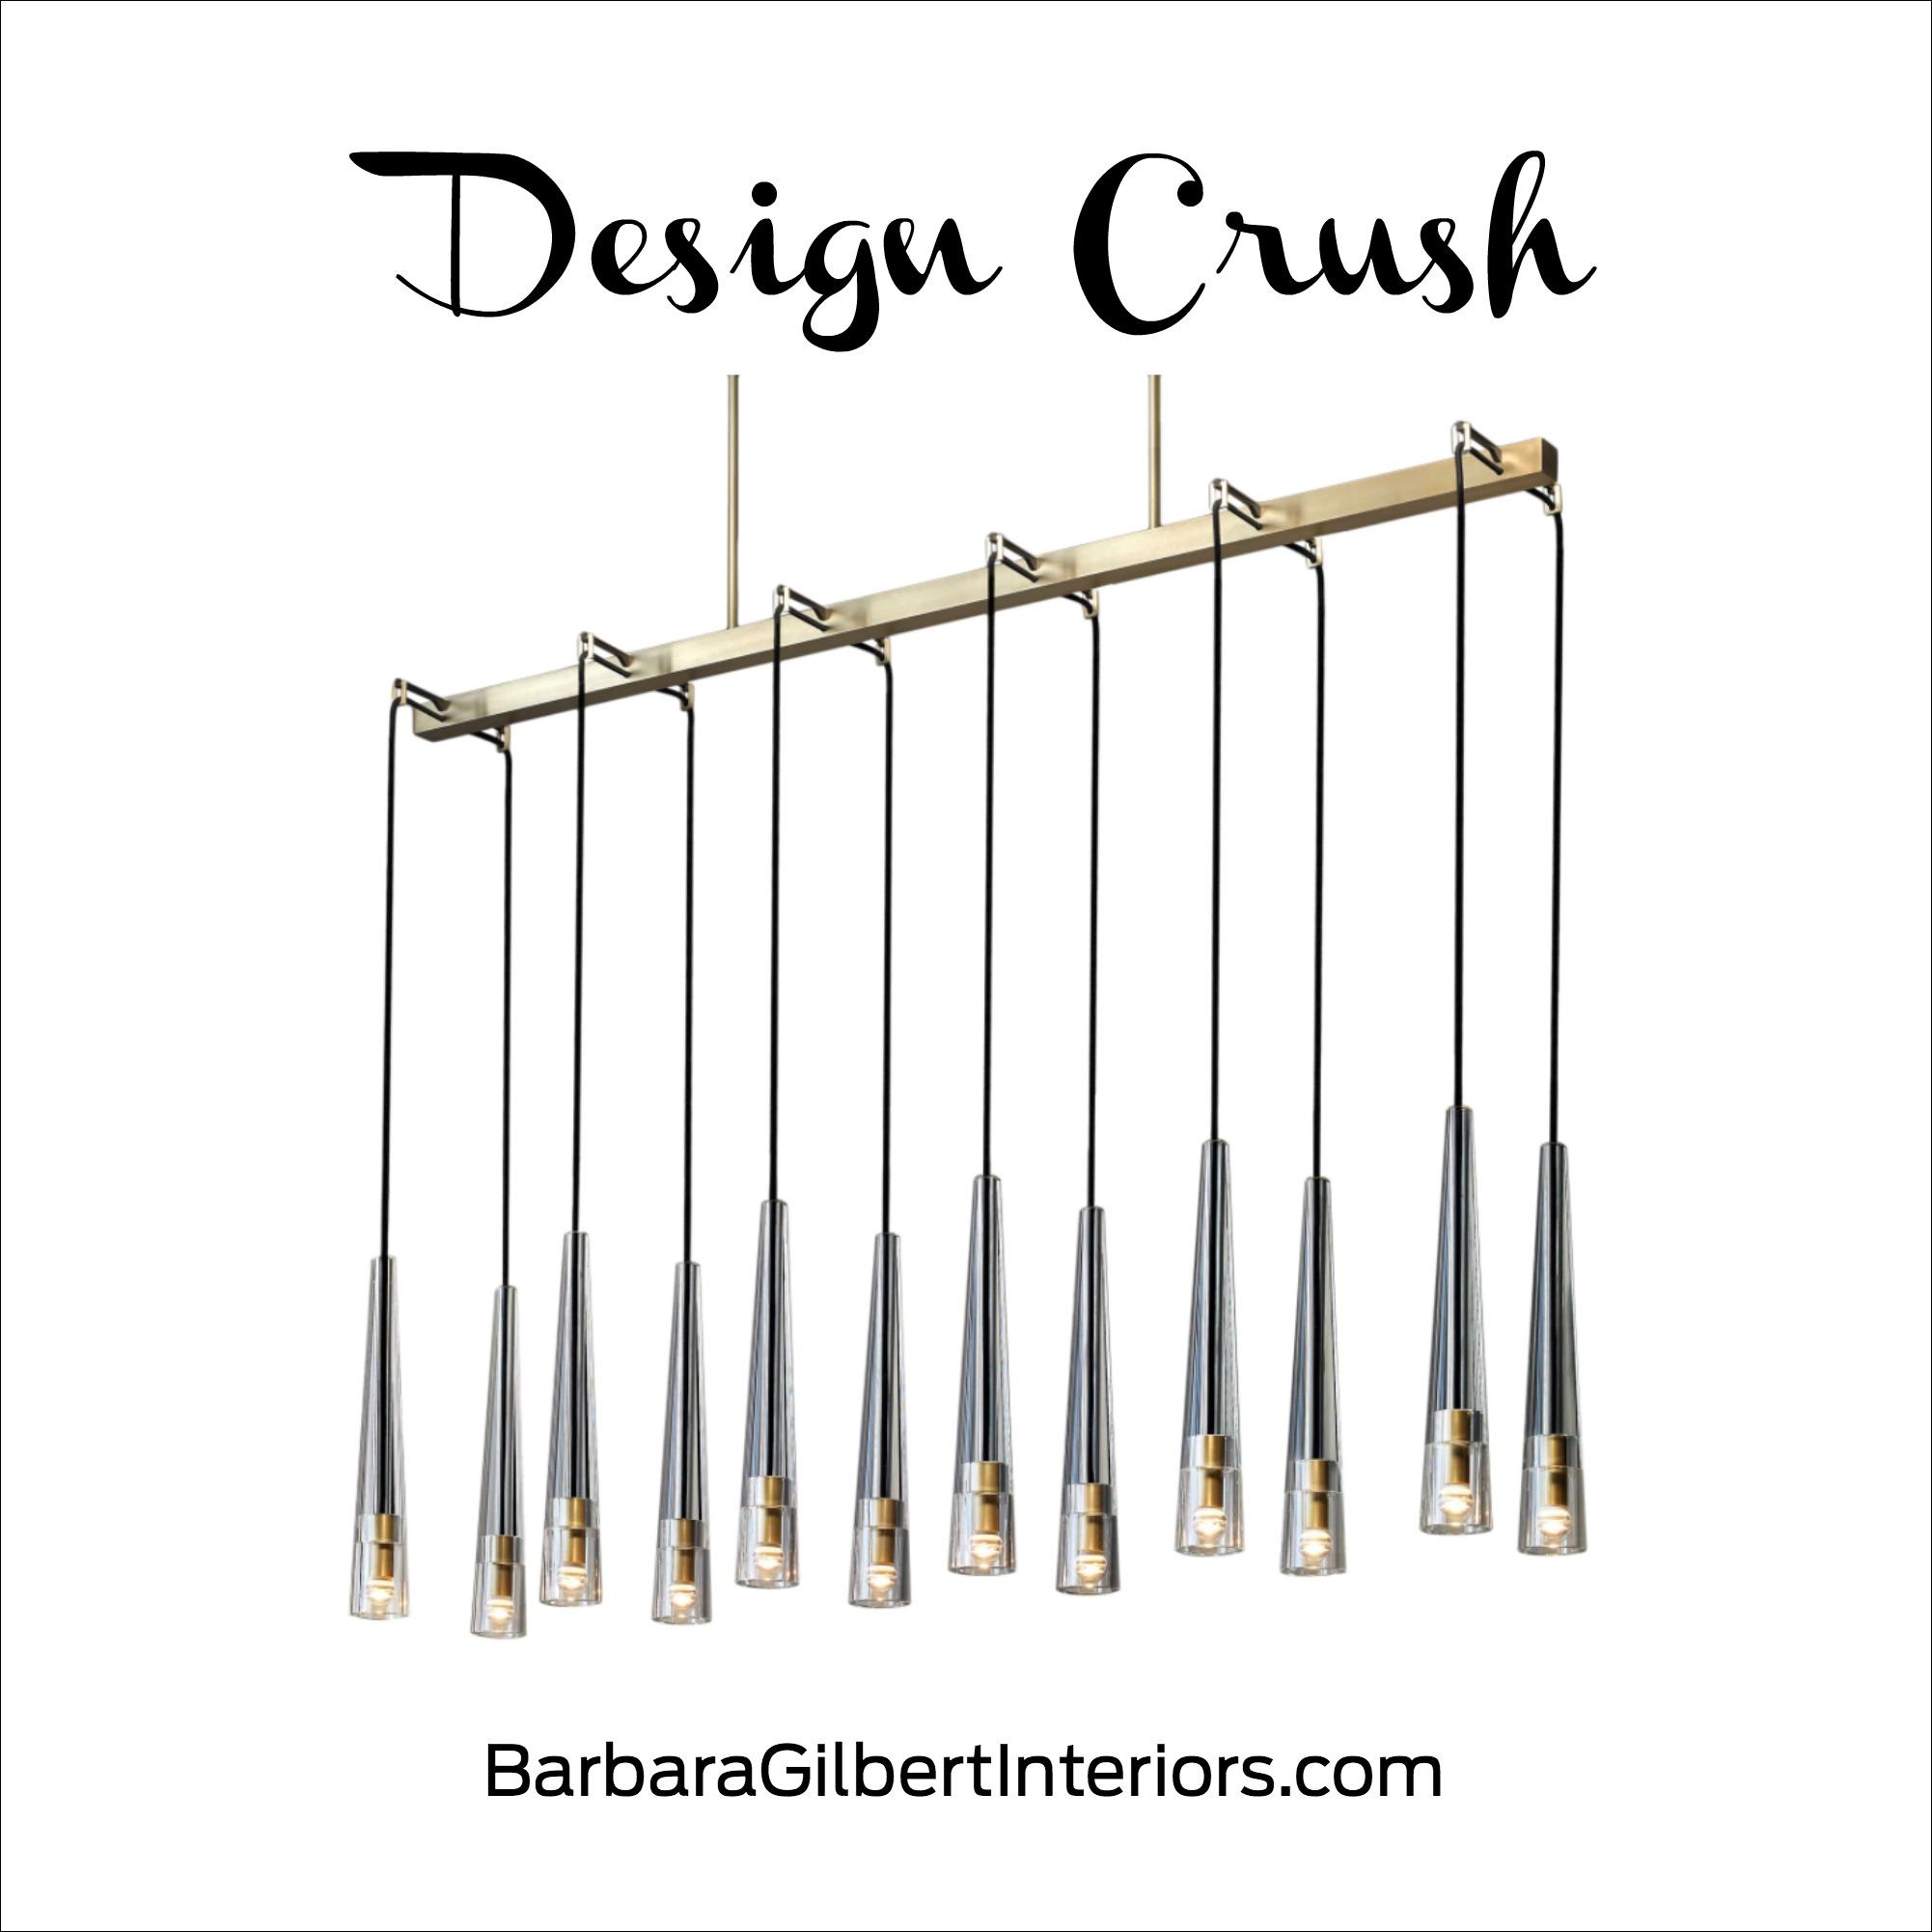 Design Crush: JBS Apollinaire Chandelier | Interior Design Dallas | Barbara Gilbert Interiors